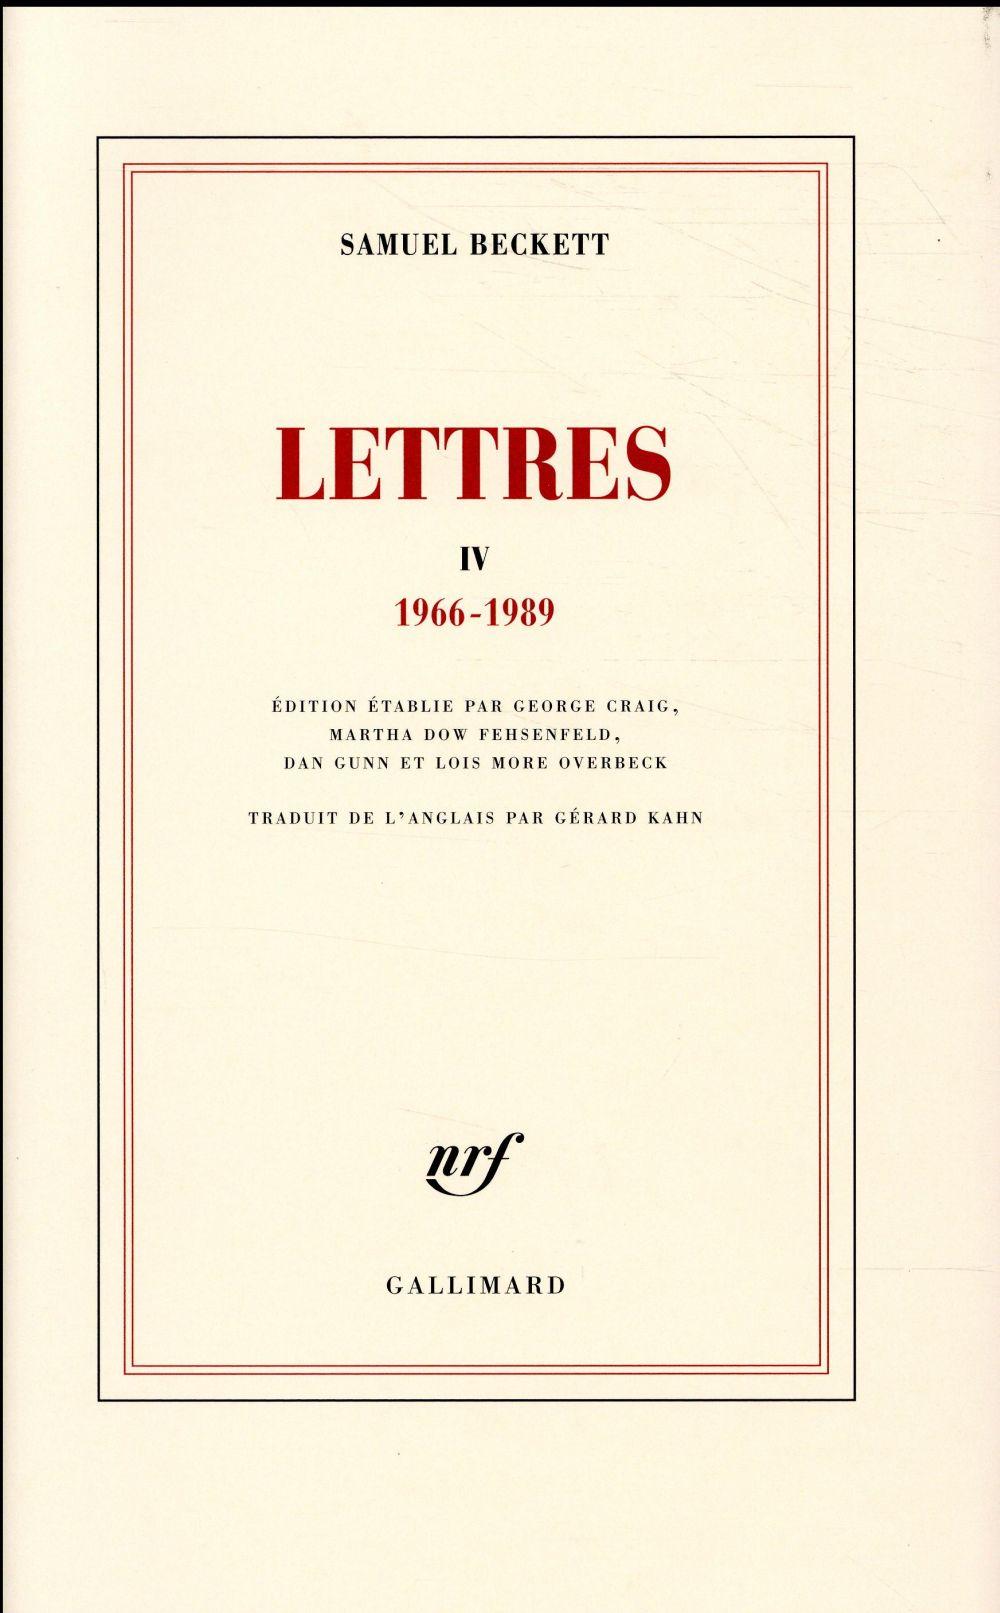 LETTRES IV - (1966-1989)